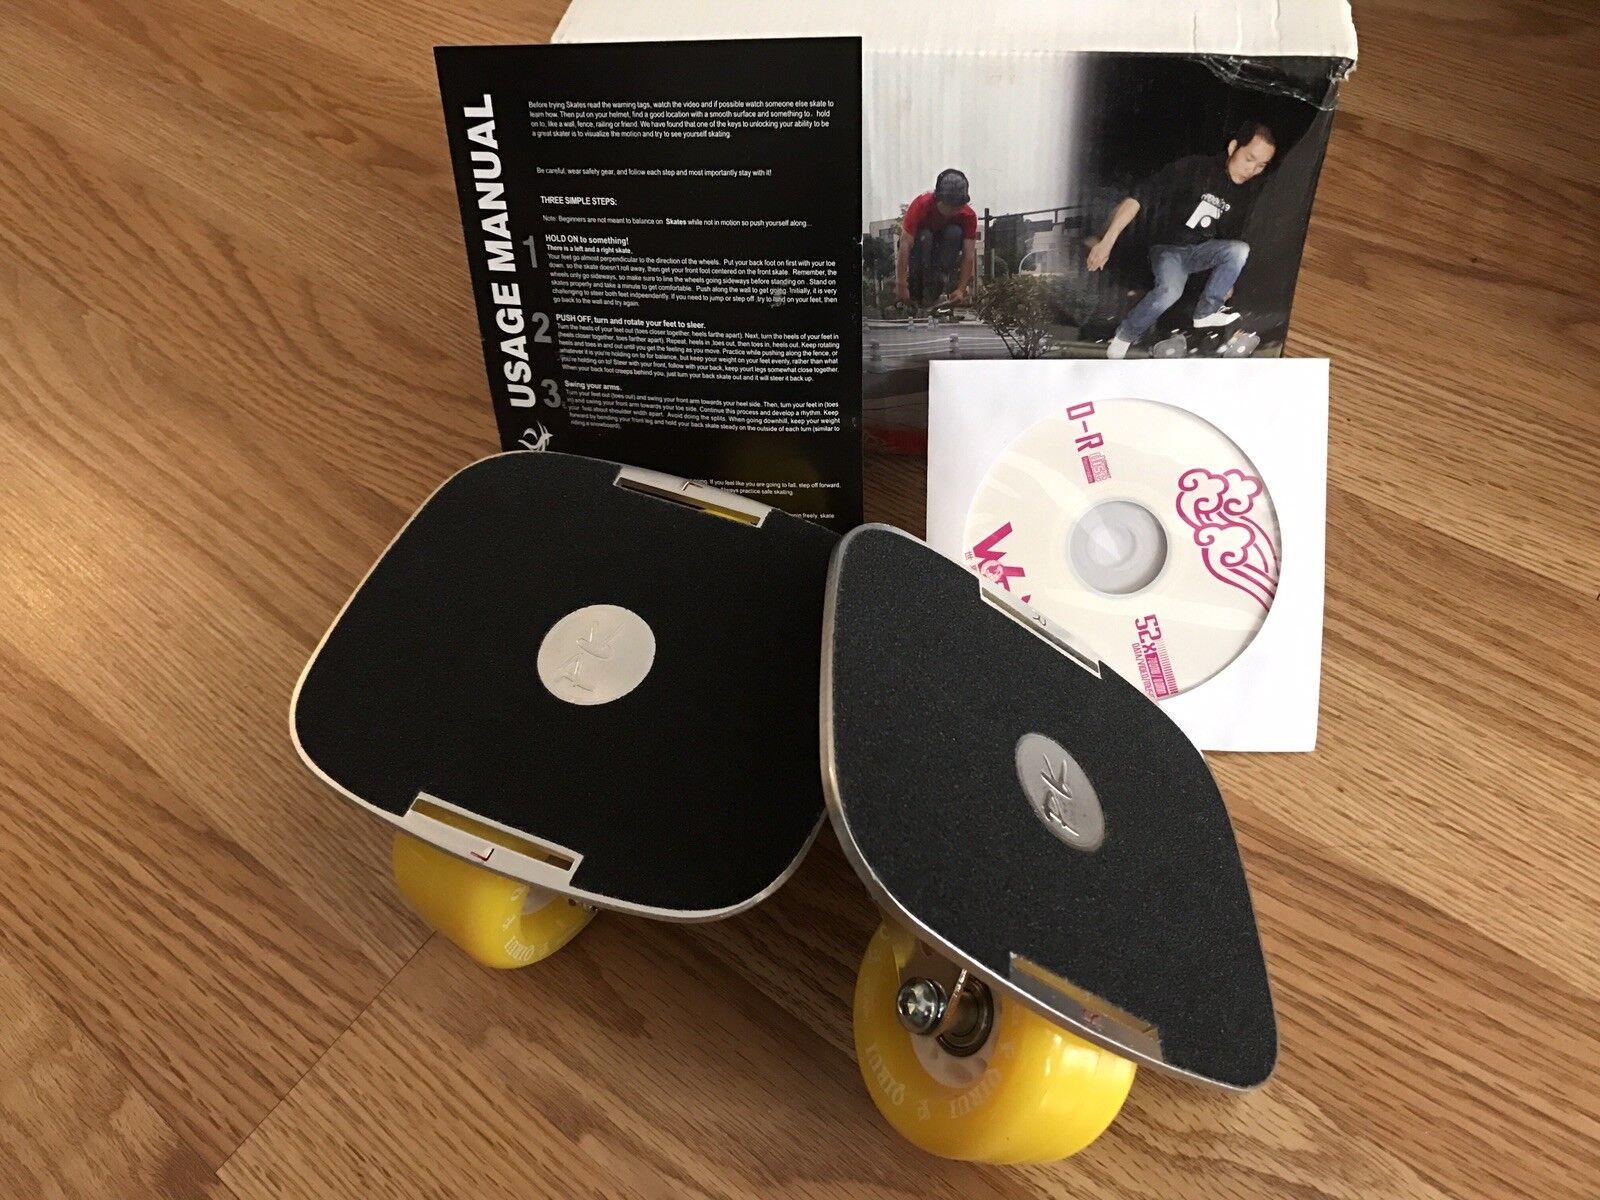 Brand New Yellow Freeline S s  + Tutorial CD + Free Shipping  unique design